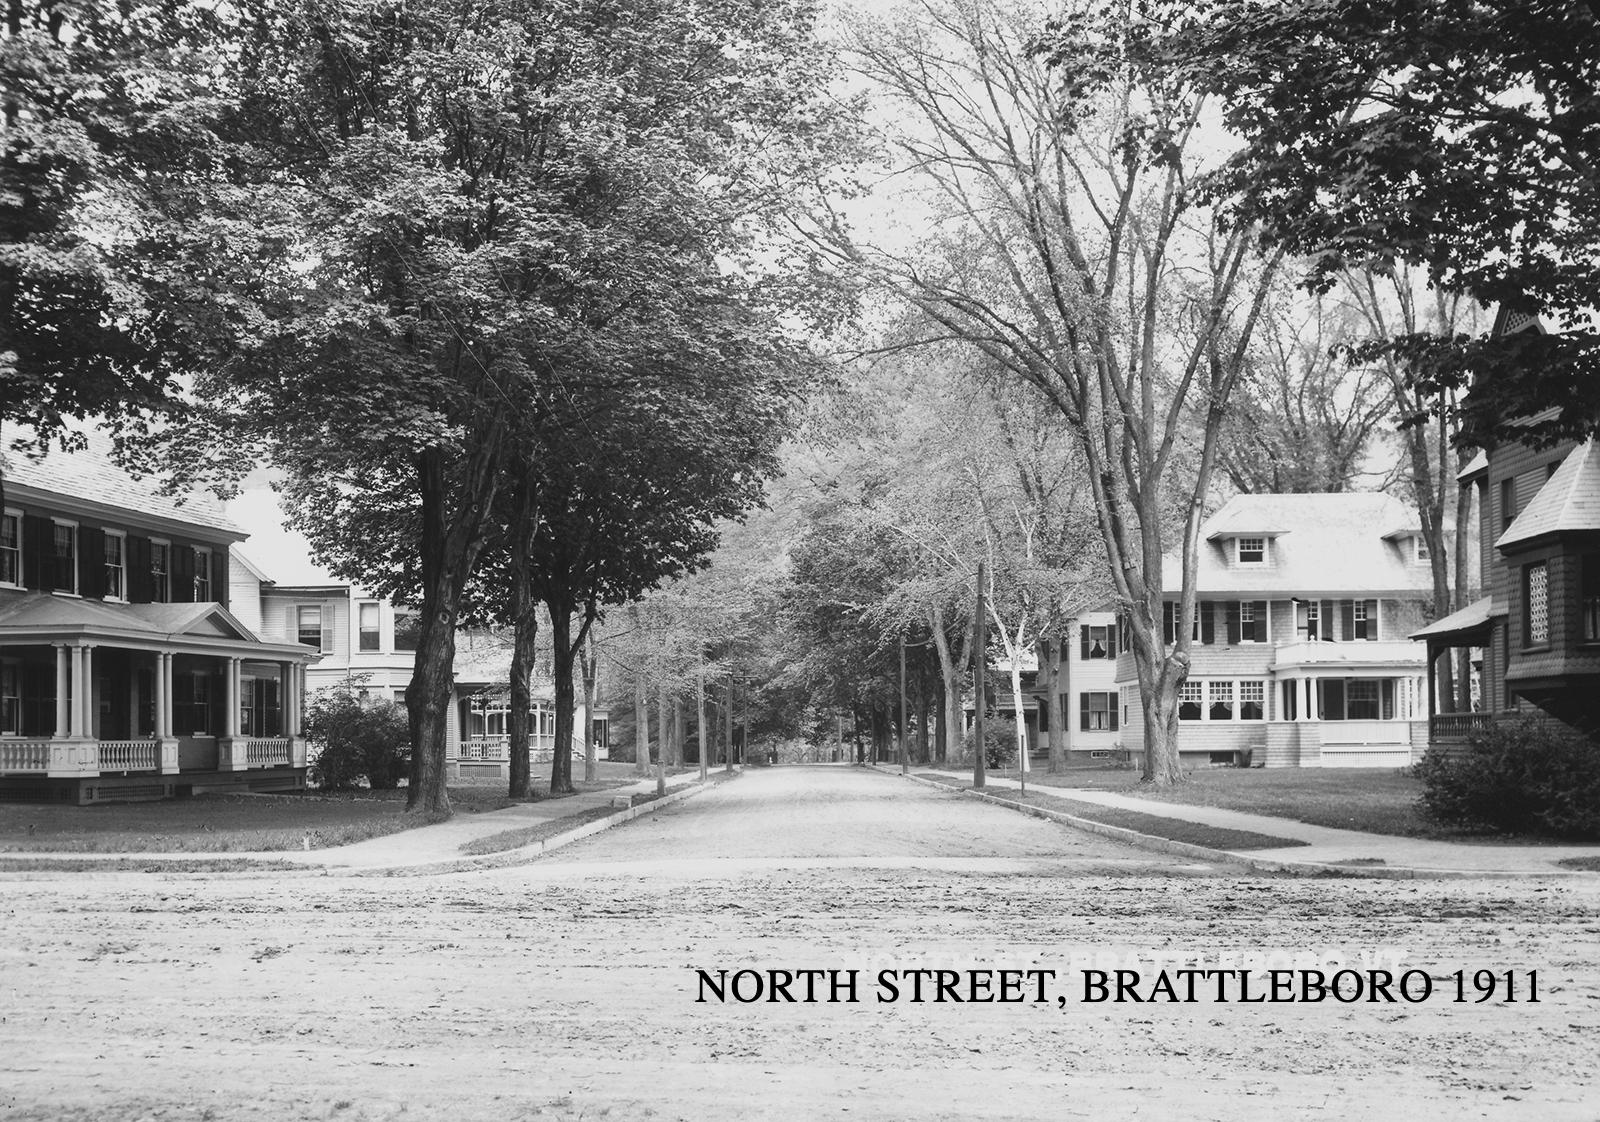 North Street Brattleboro